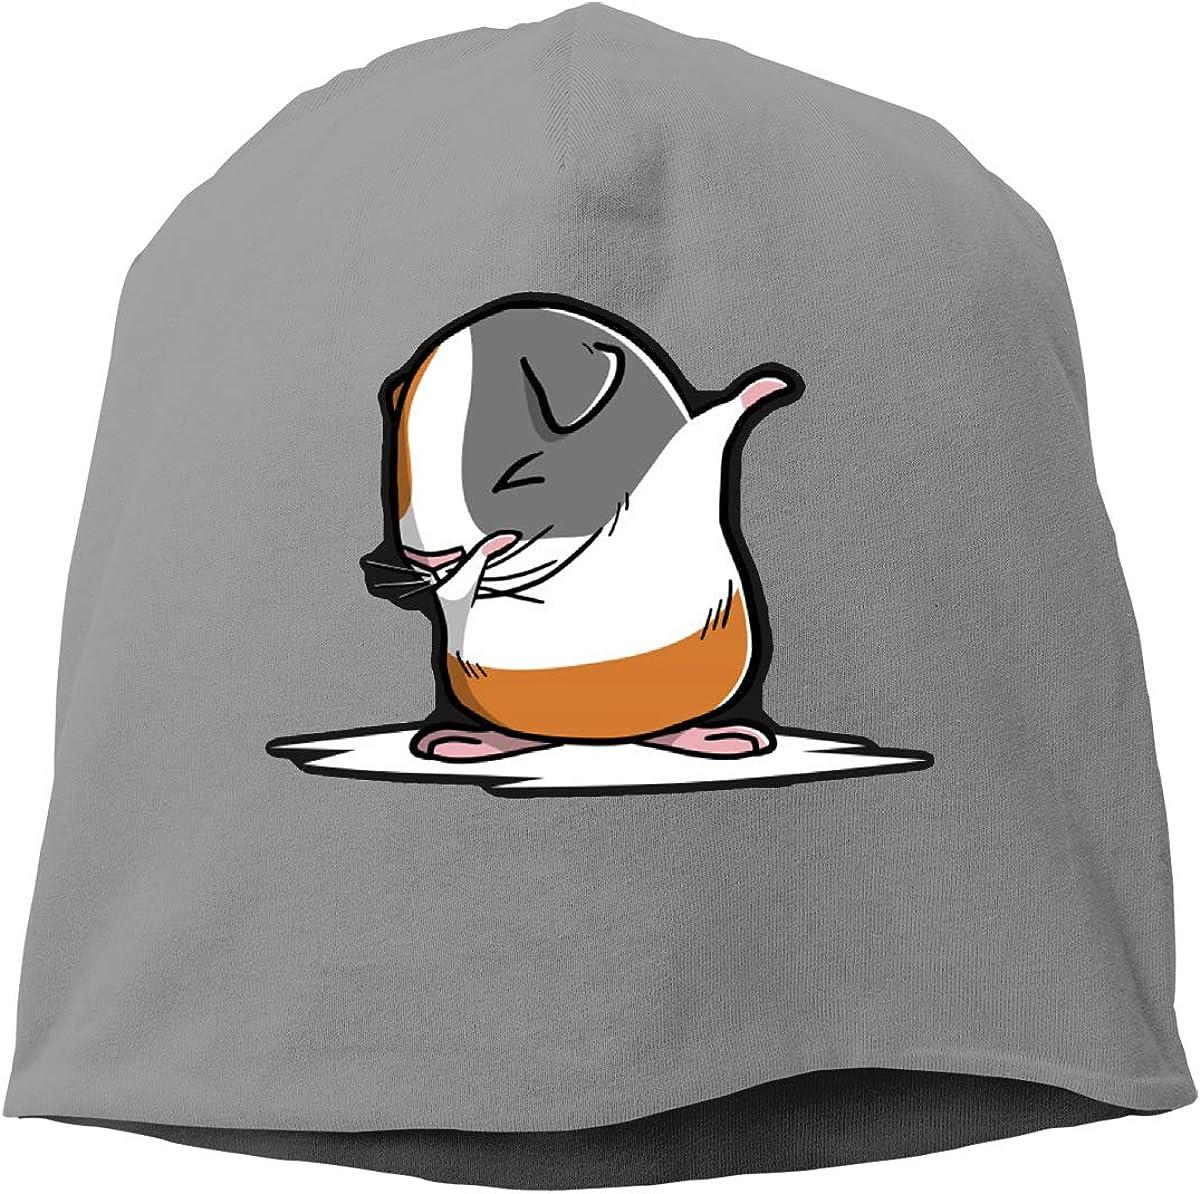 Unisex Dabbing Guinea Pig Running Beanie Cap Cuffed Plain Skull Cap Hat